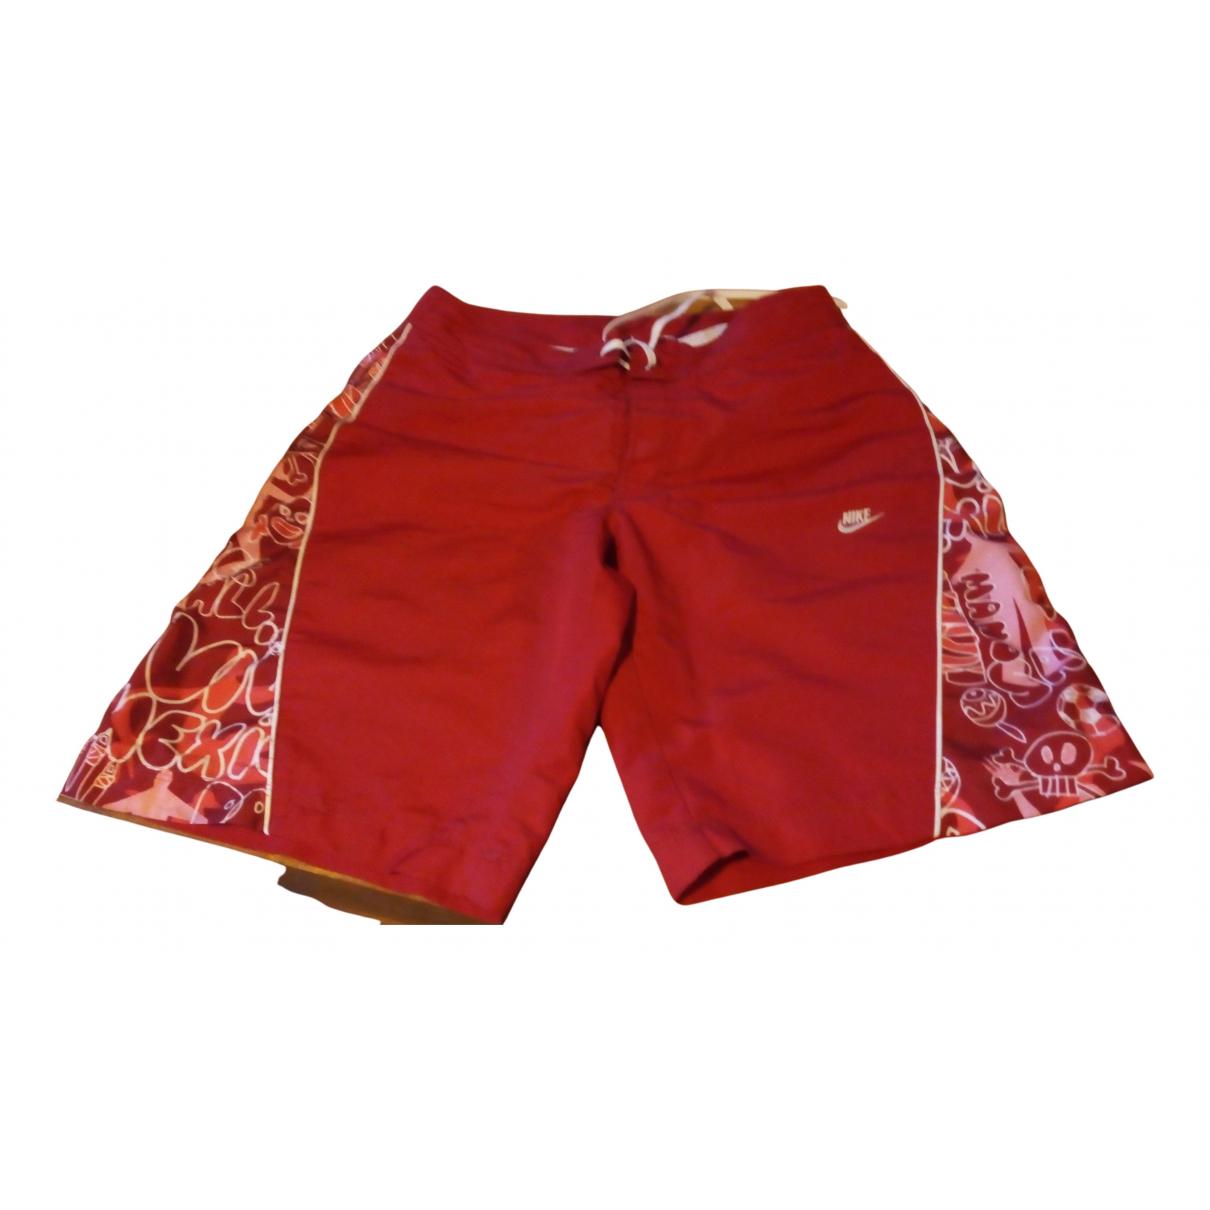 Nike \N Badeanzug in  Rot Polyester